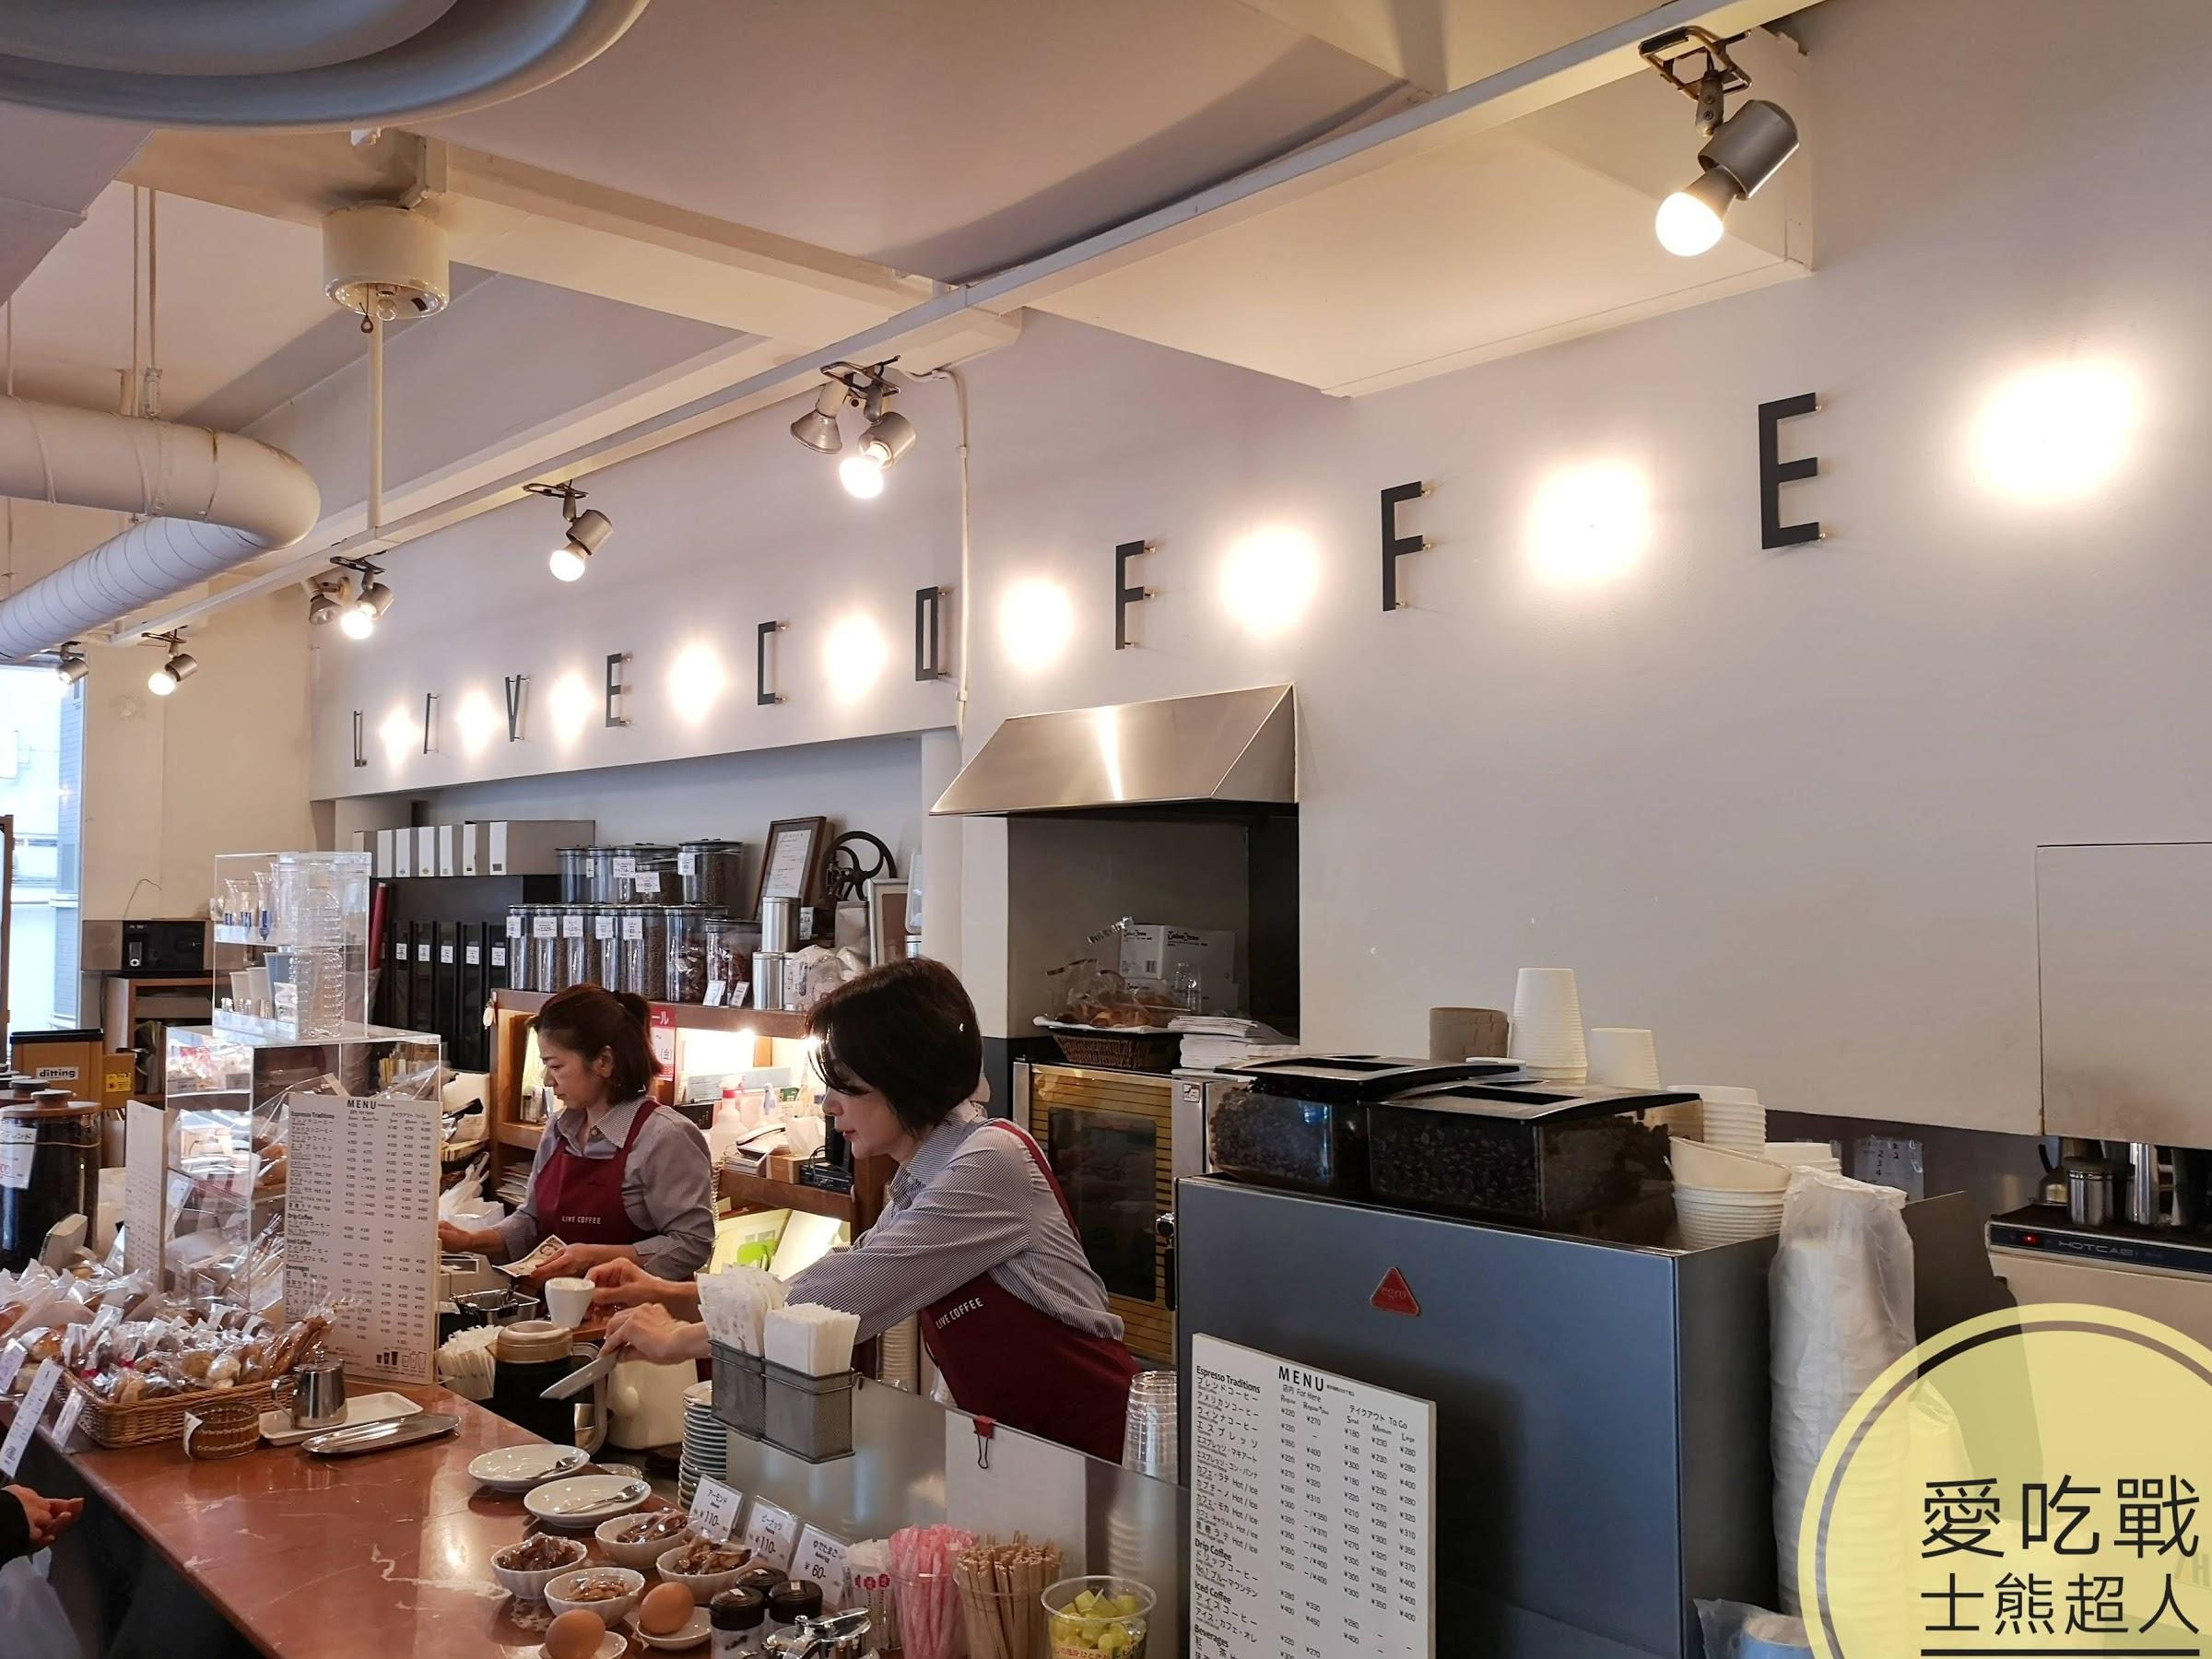 。東京 築地。Live Coffee(ライブコーヒー)-築地在地人的日常,自家烘焙的職人咖啡